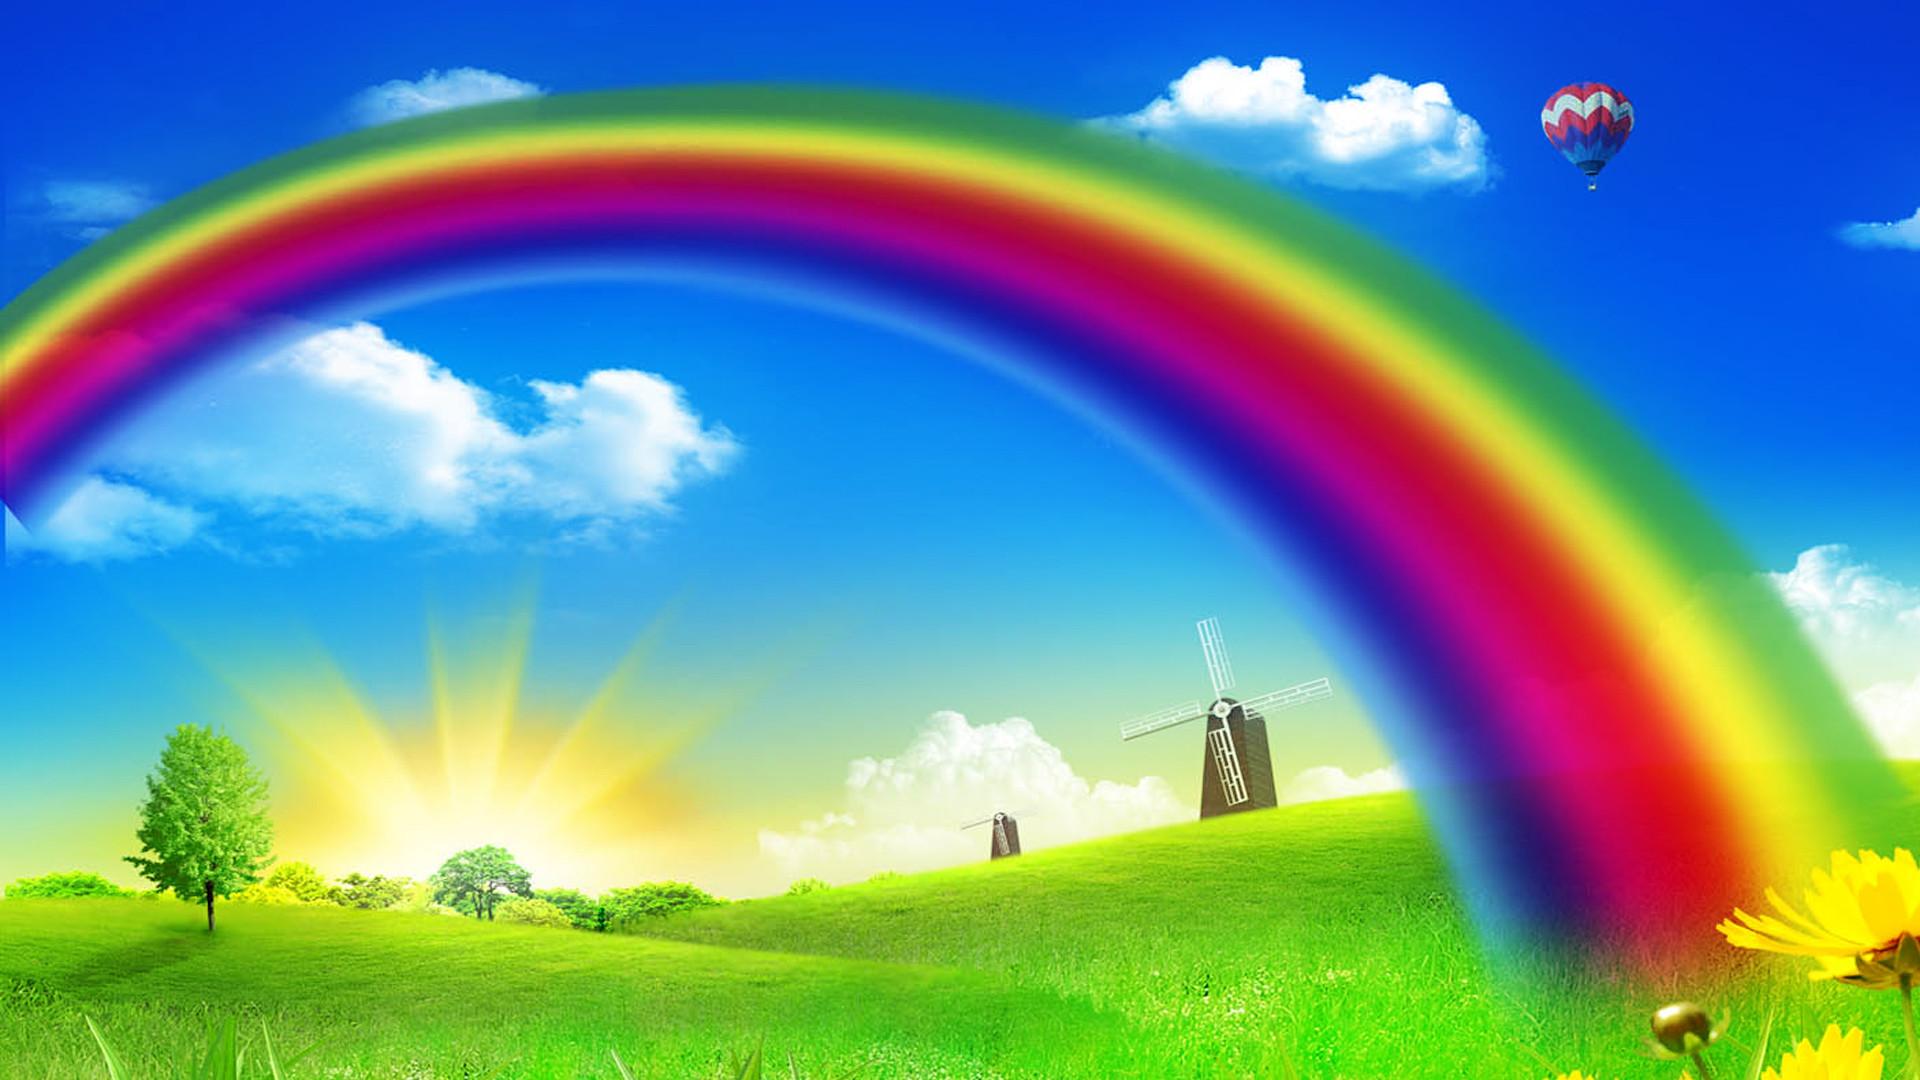 Backgroud Rainbow wallpapers HD.